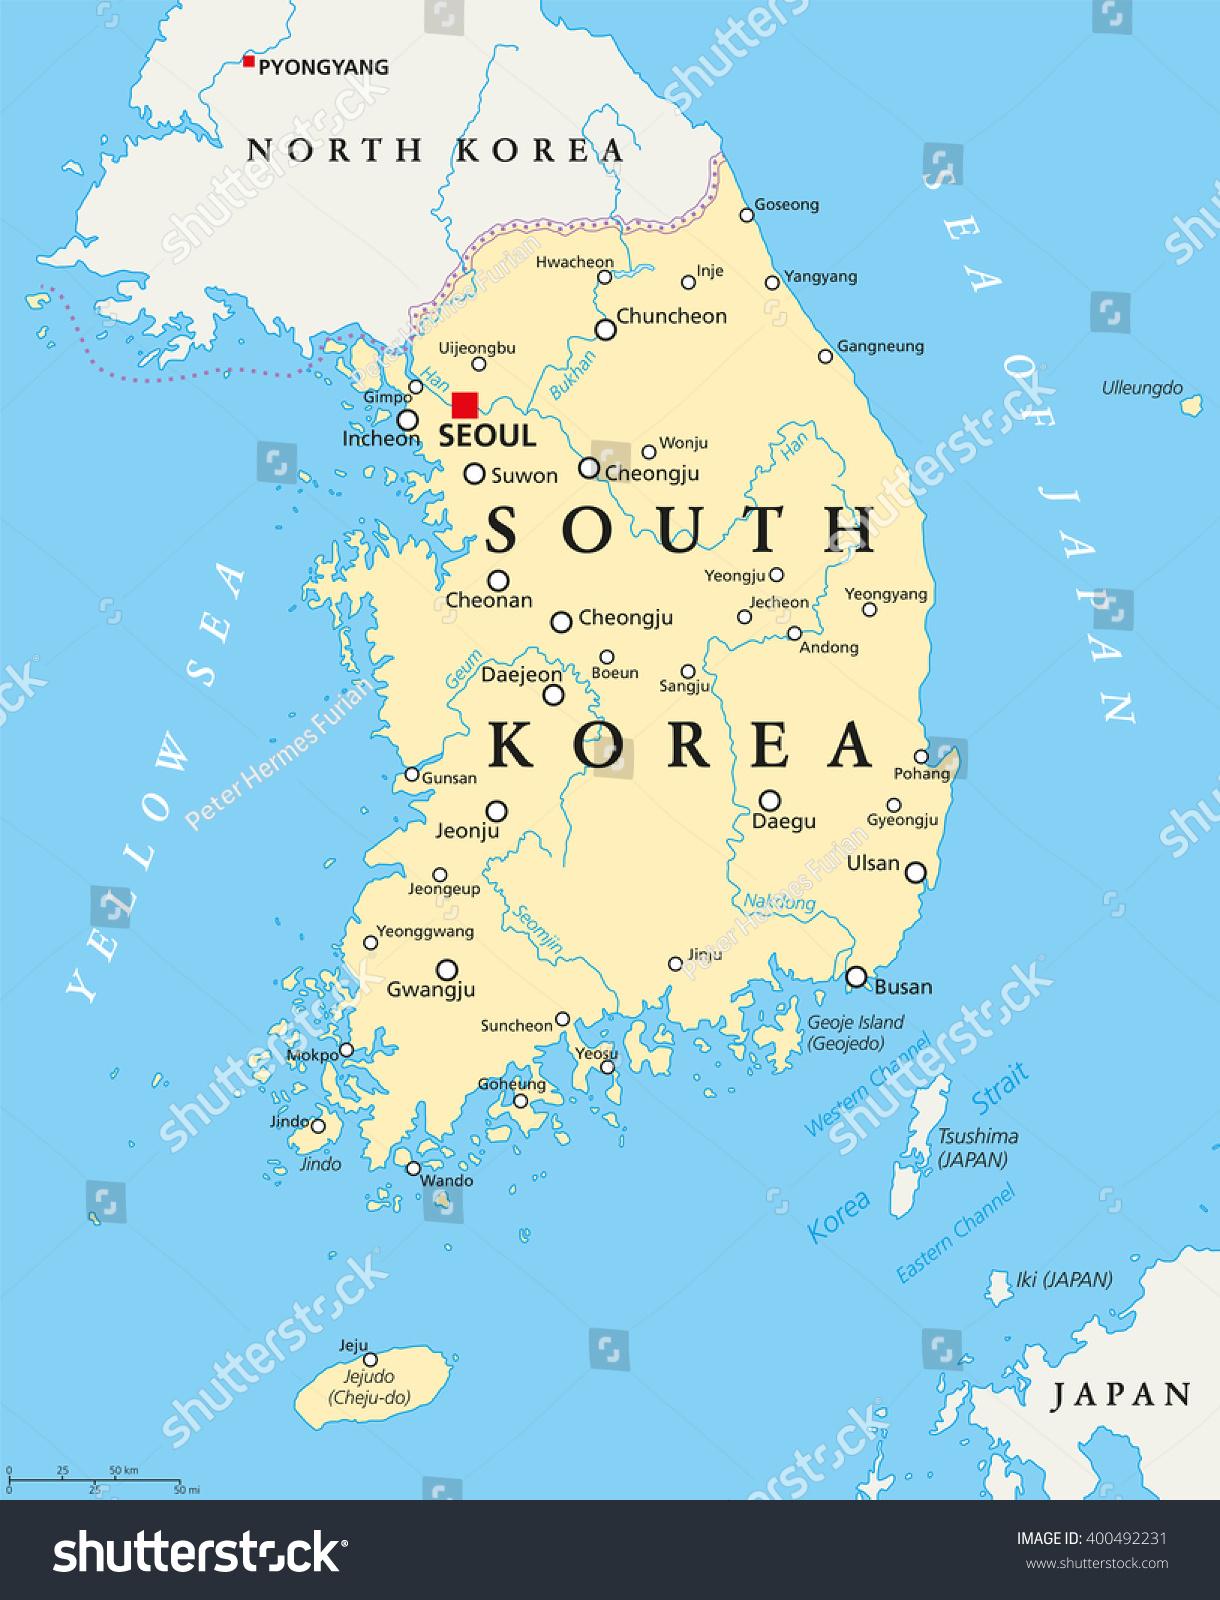 Ulsan Korea Map.South Korea Political Map Capital Seoul Stock Vector Royalty Free